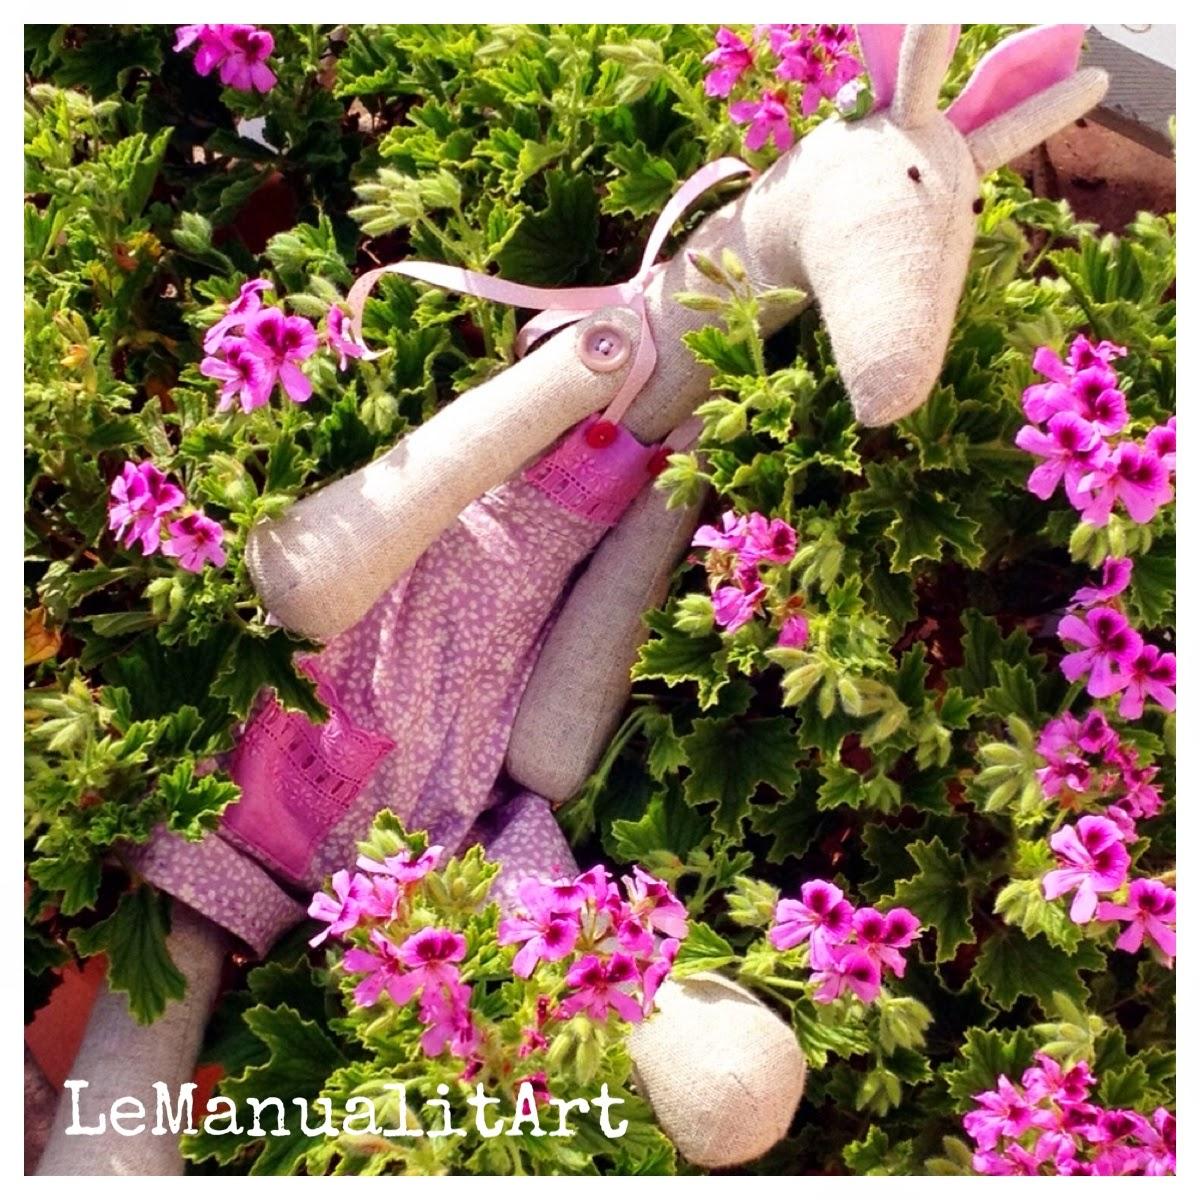 Costura creativa: muñeco de trapo para niños